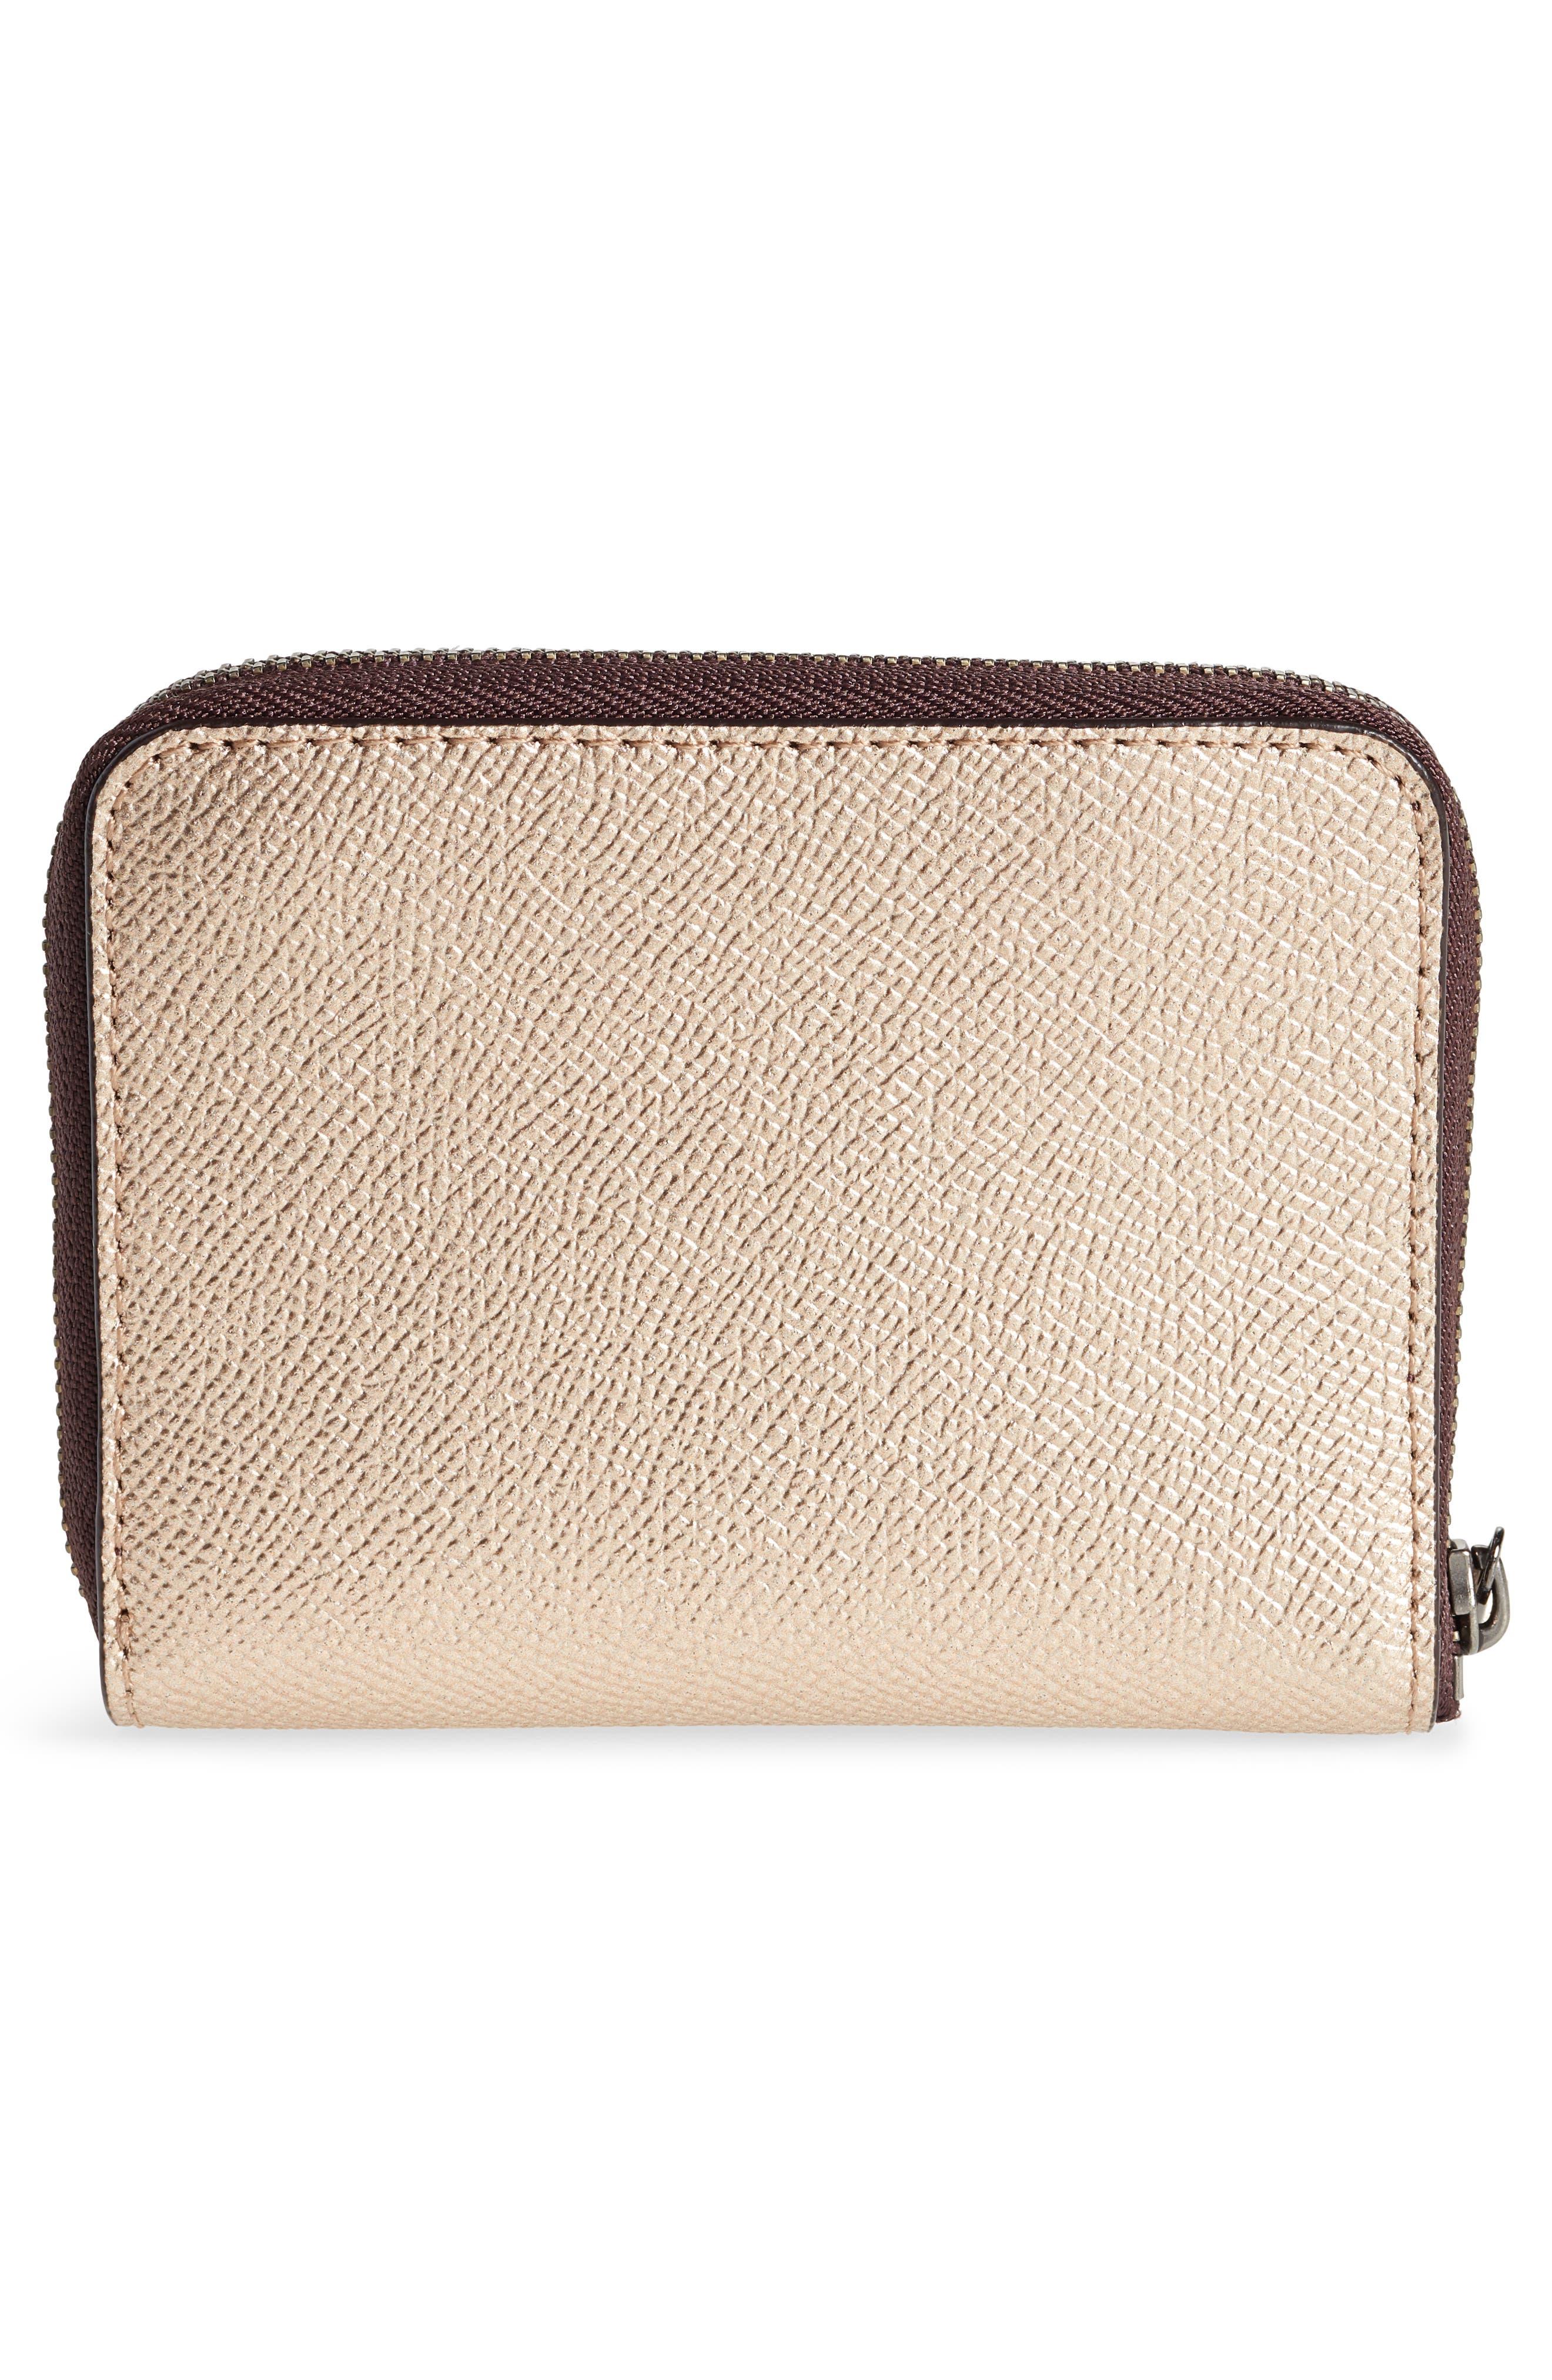 COACH,                             Small Metallic Leather Zip Around Wallet,                             Alternate thumbnail 4, color,                             PLATINUM